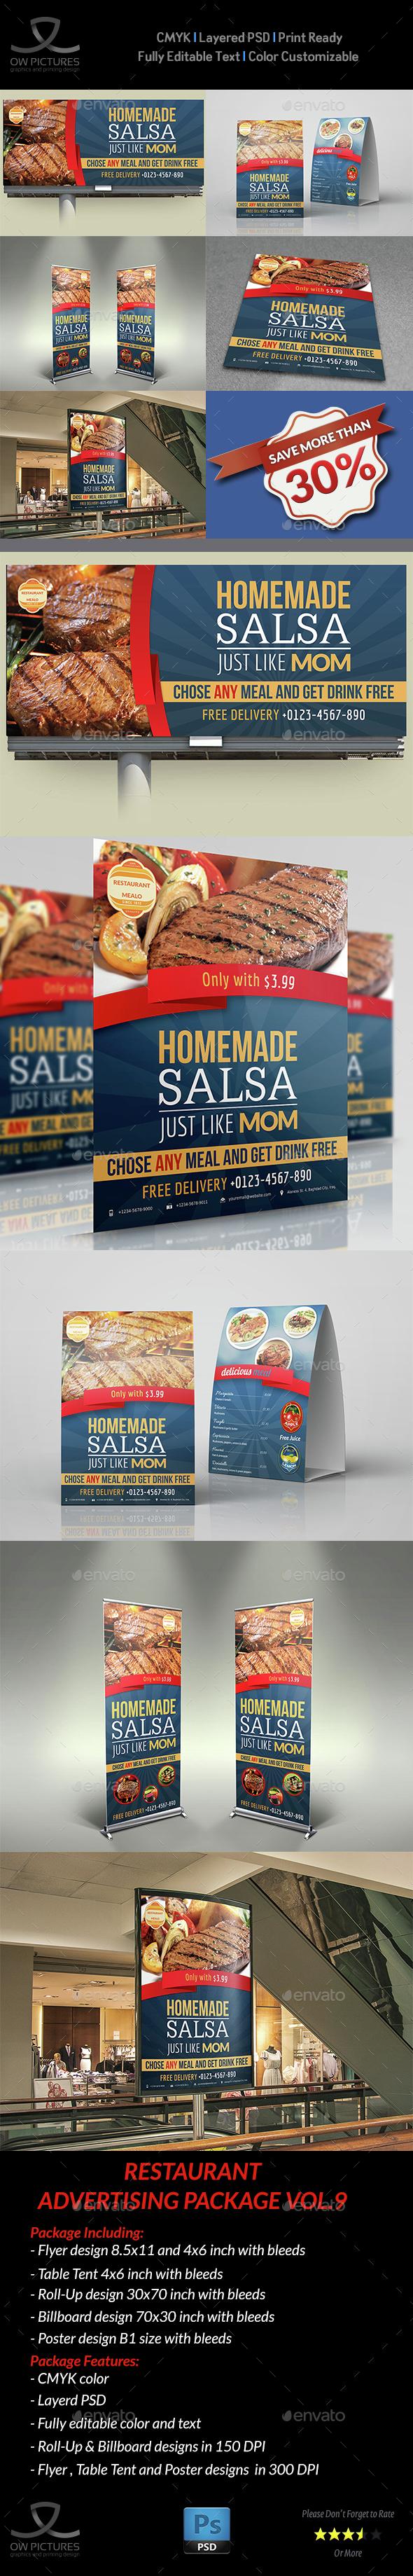 Restaurant Advertising Bundle Vol.9 - Signage Print Templates